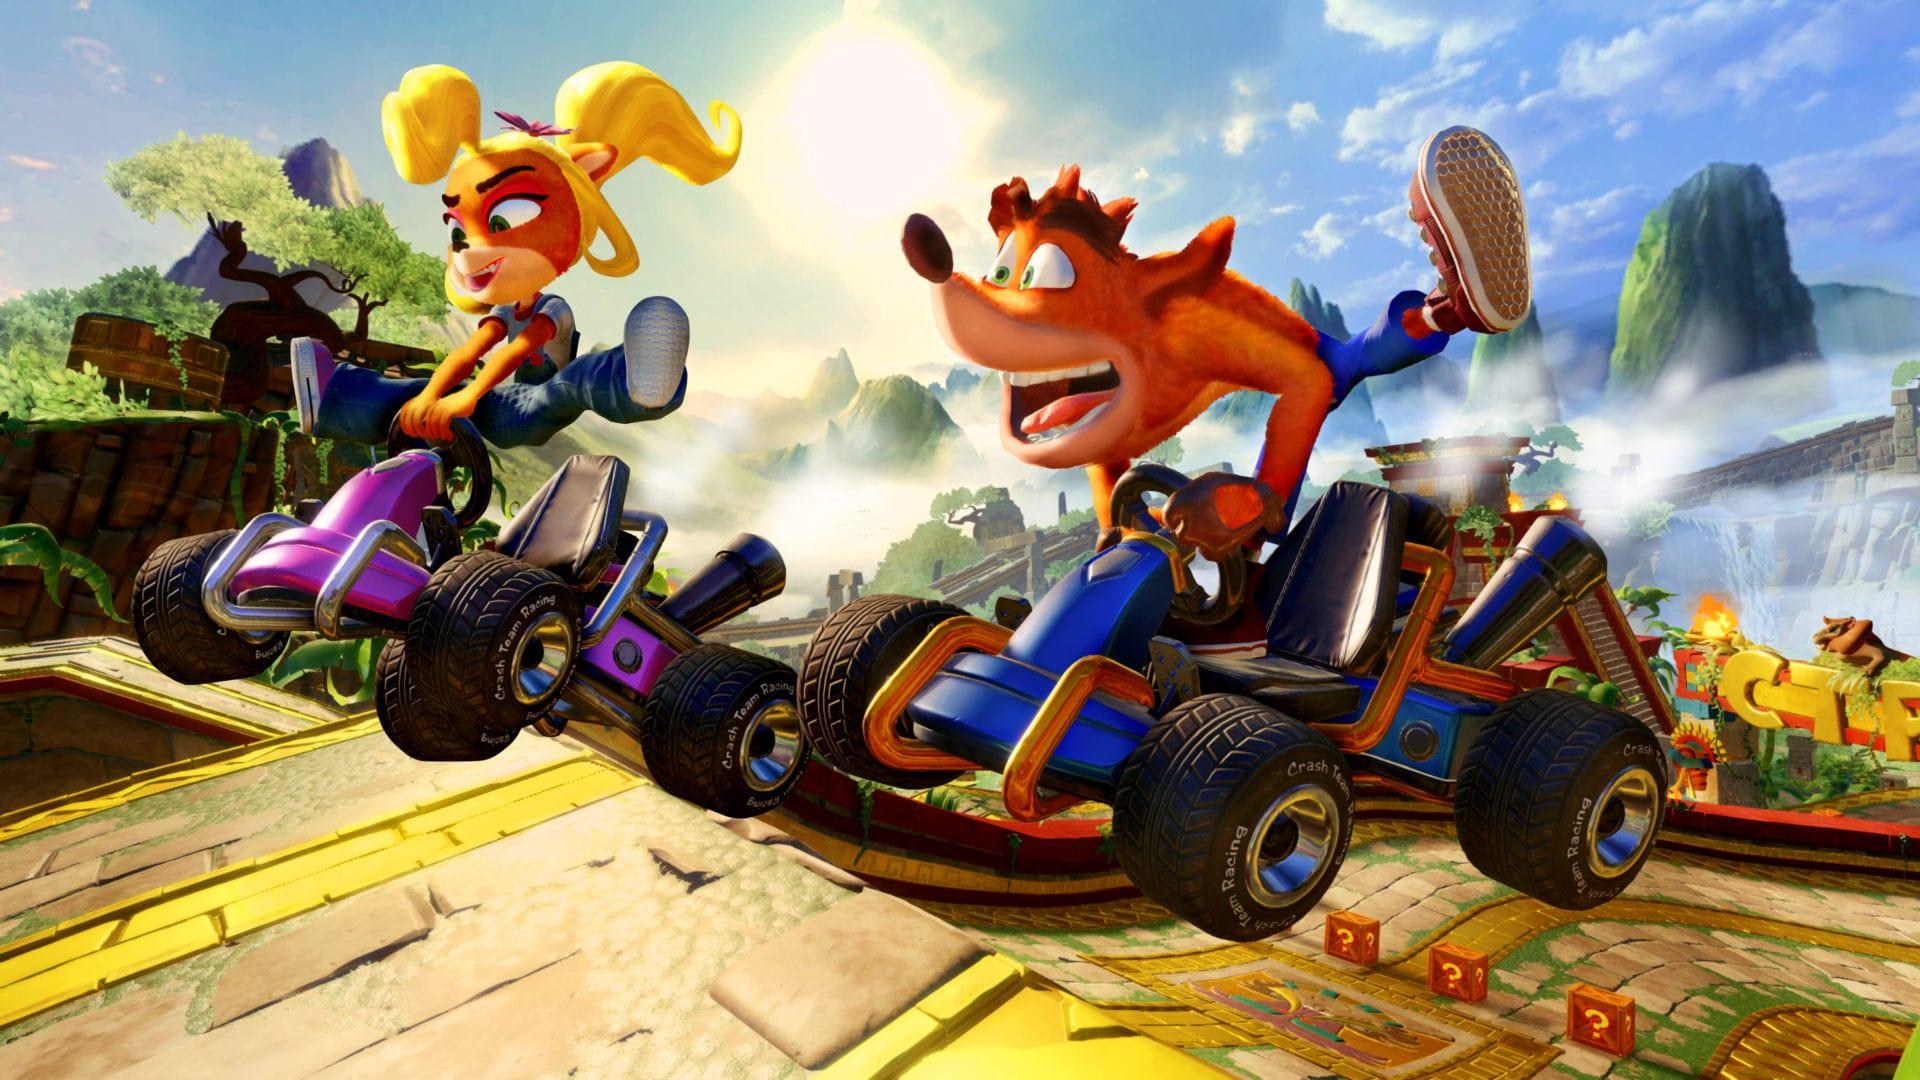 Crash Team Racing Nitro-Fueled Content Highlight Trailer